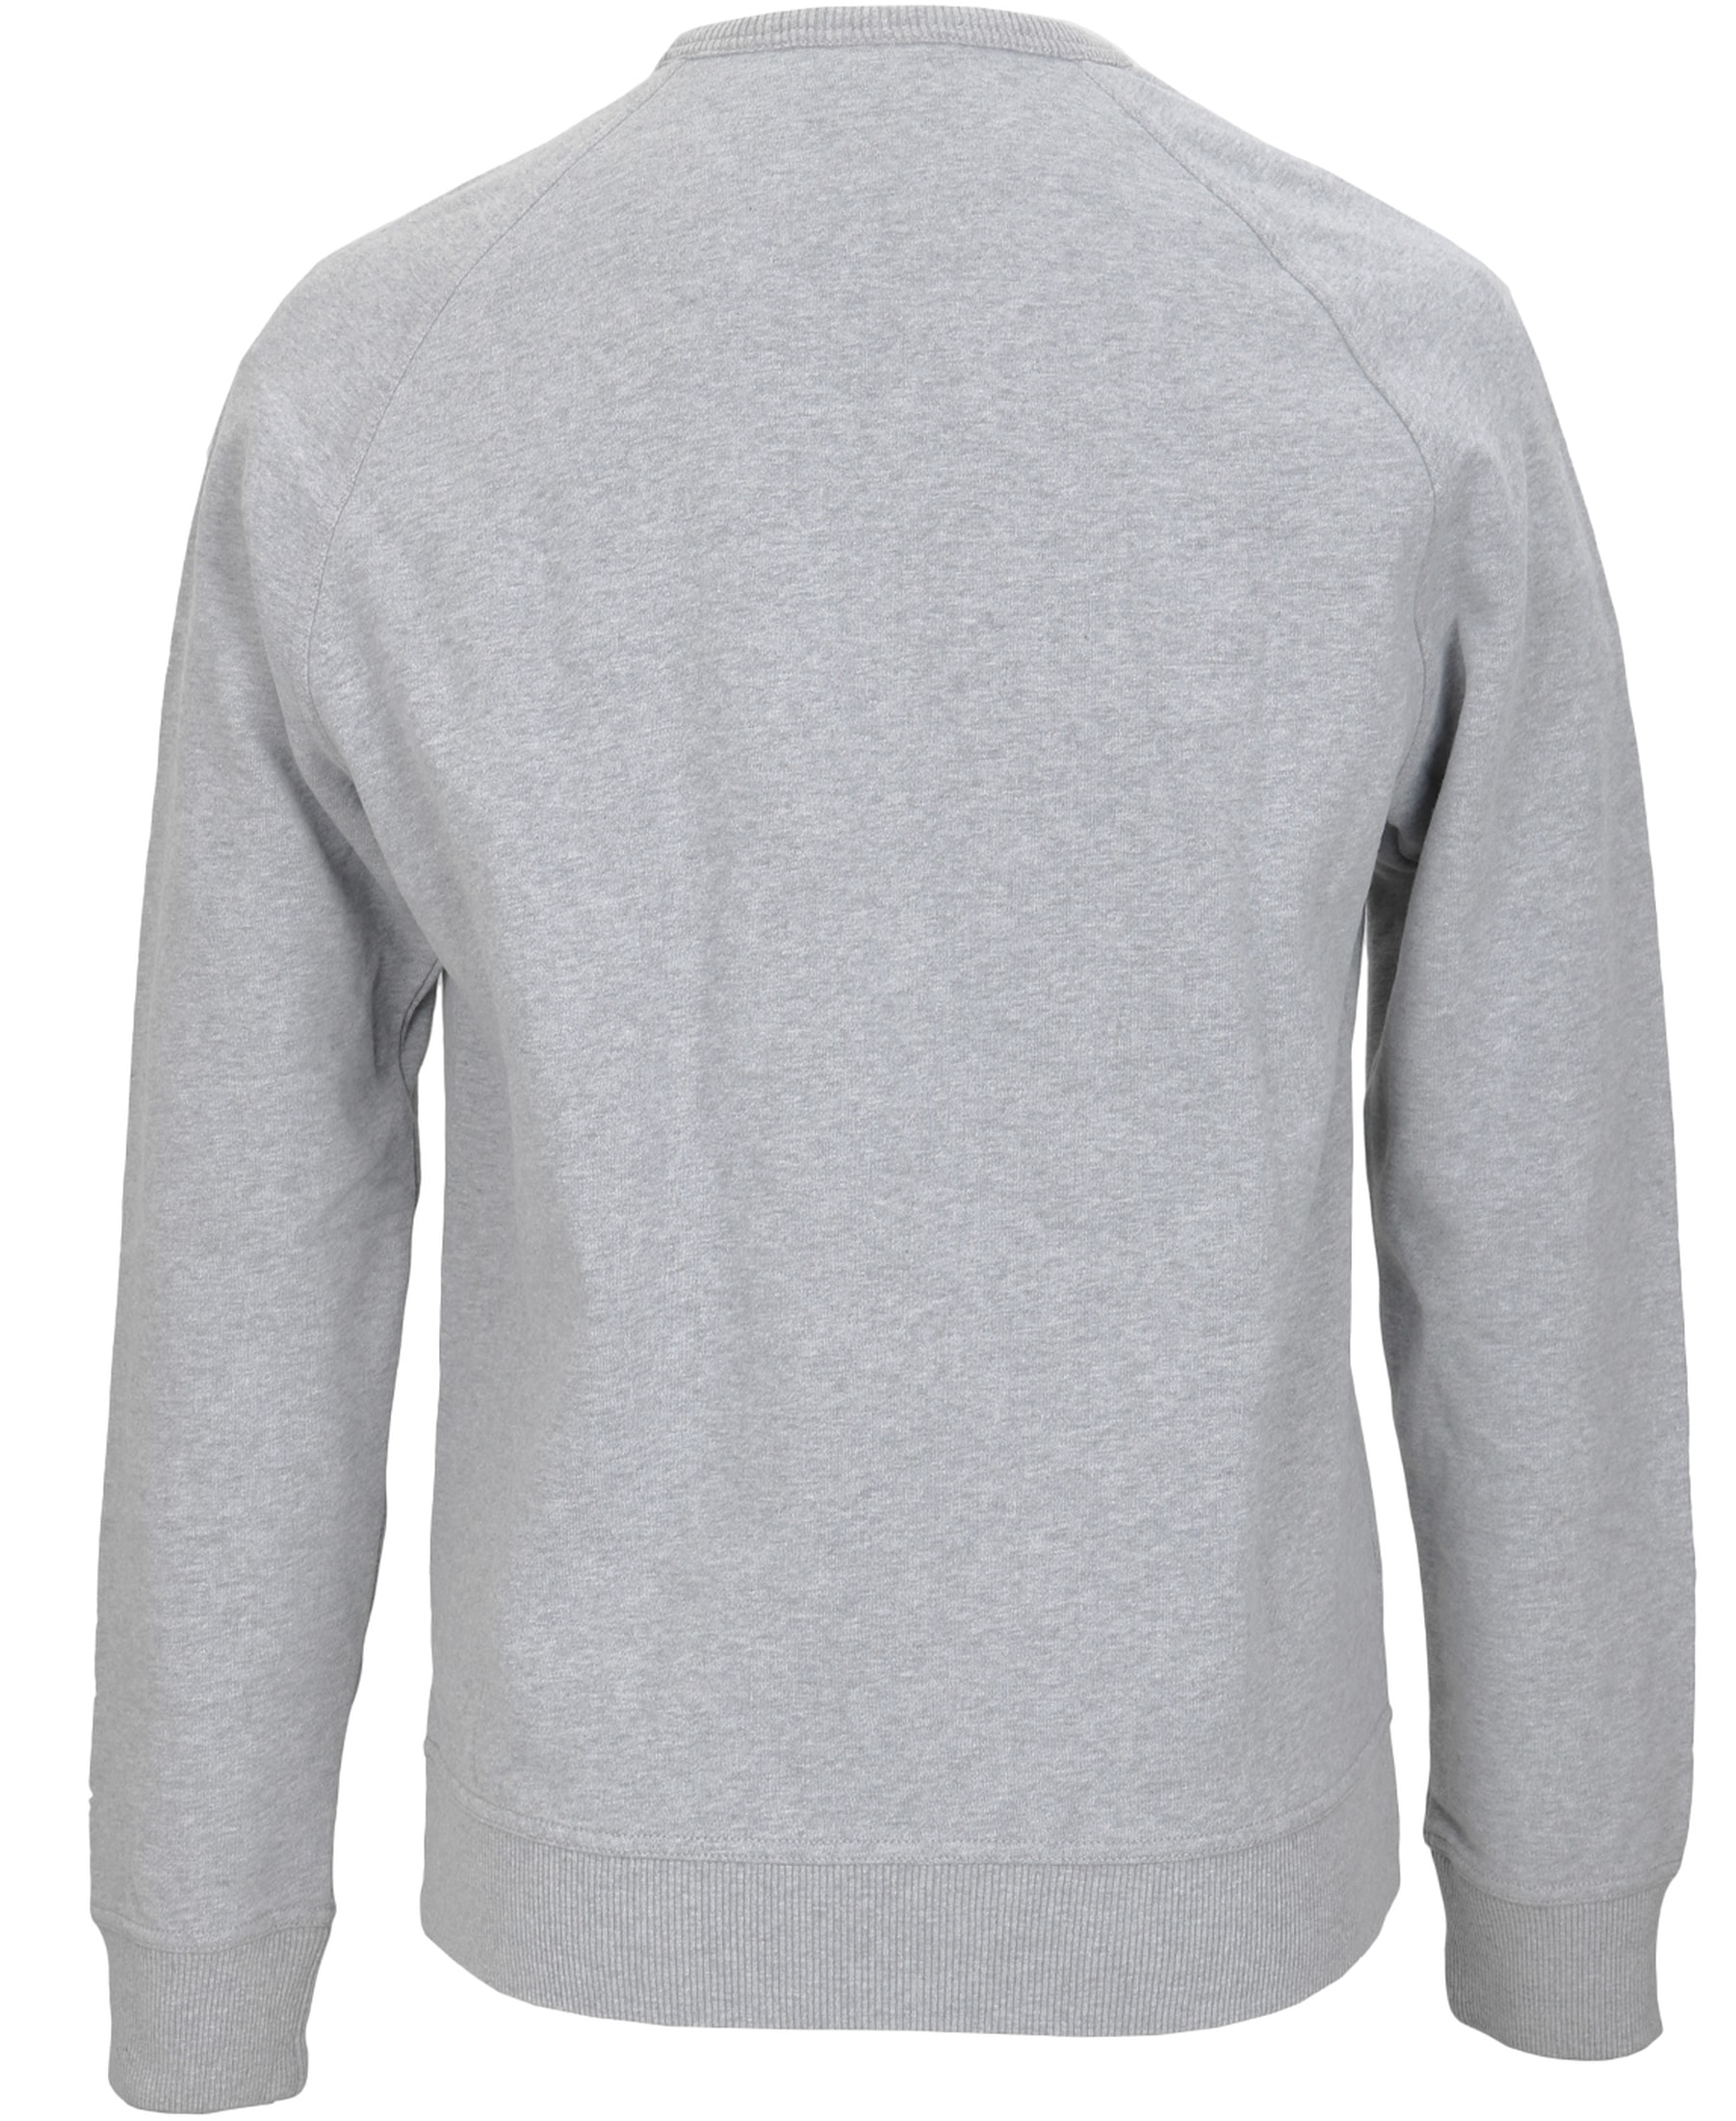 Timberland Sweatshirt Grau Raglan foto 2